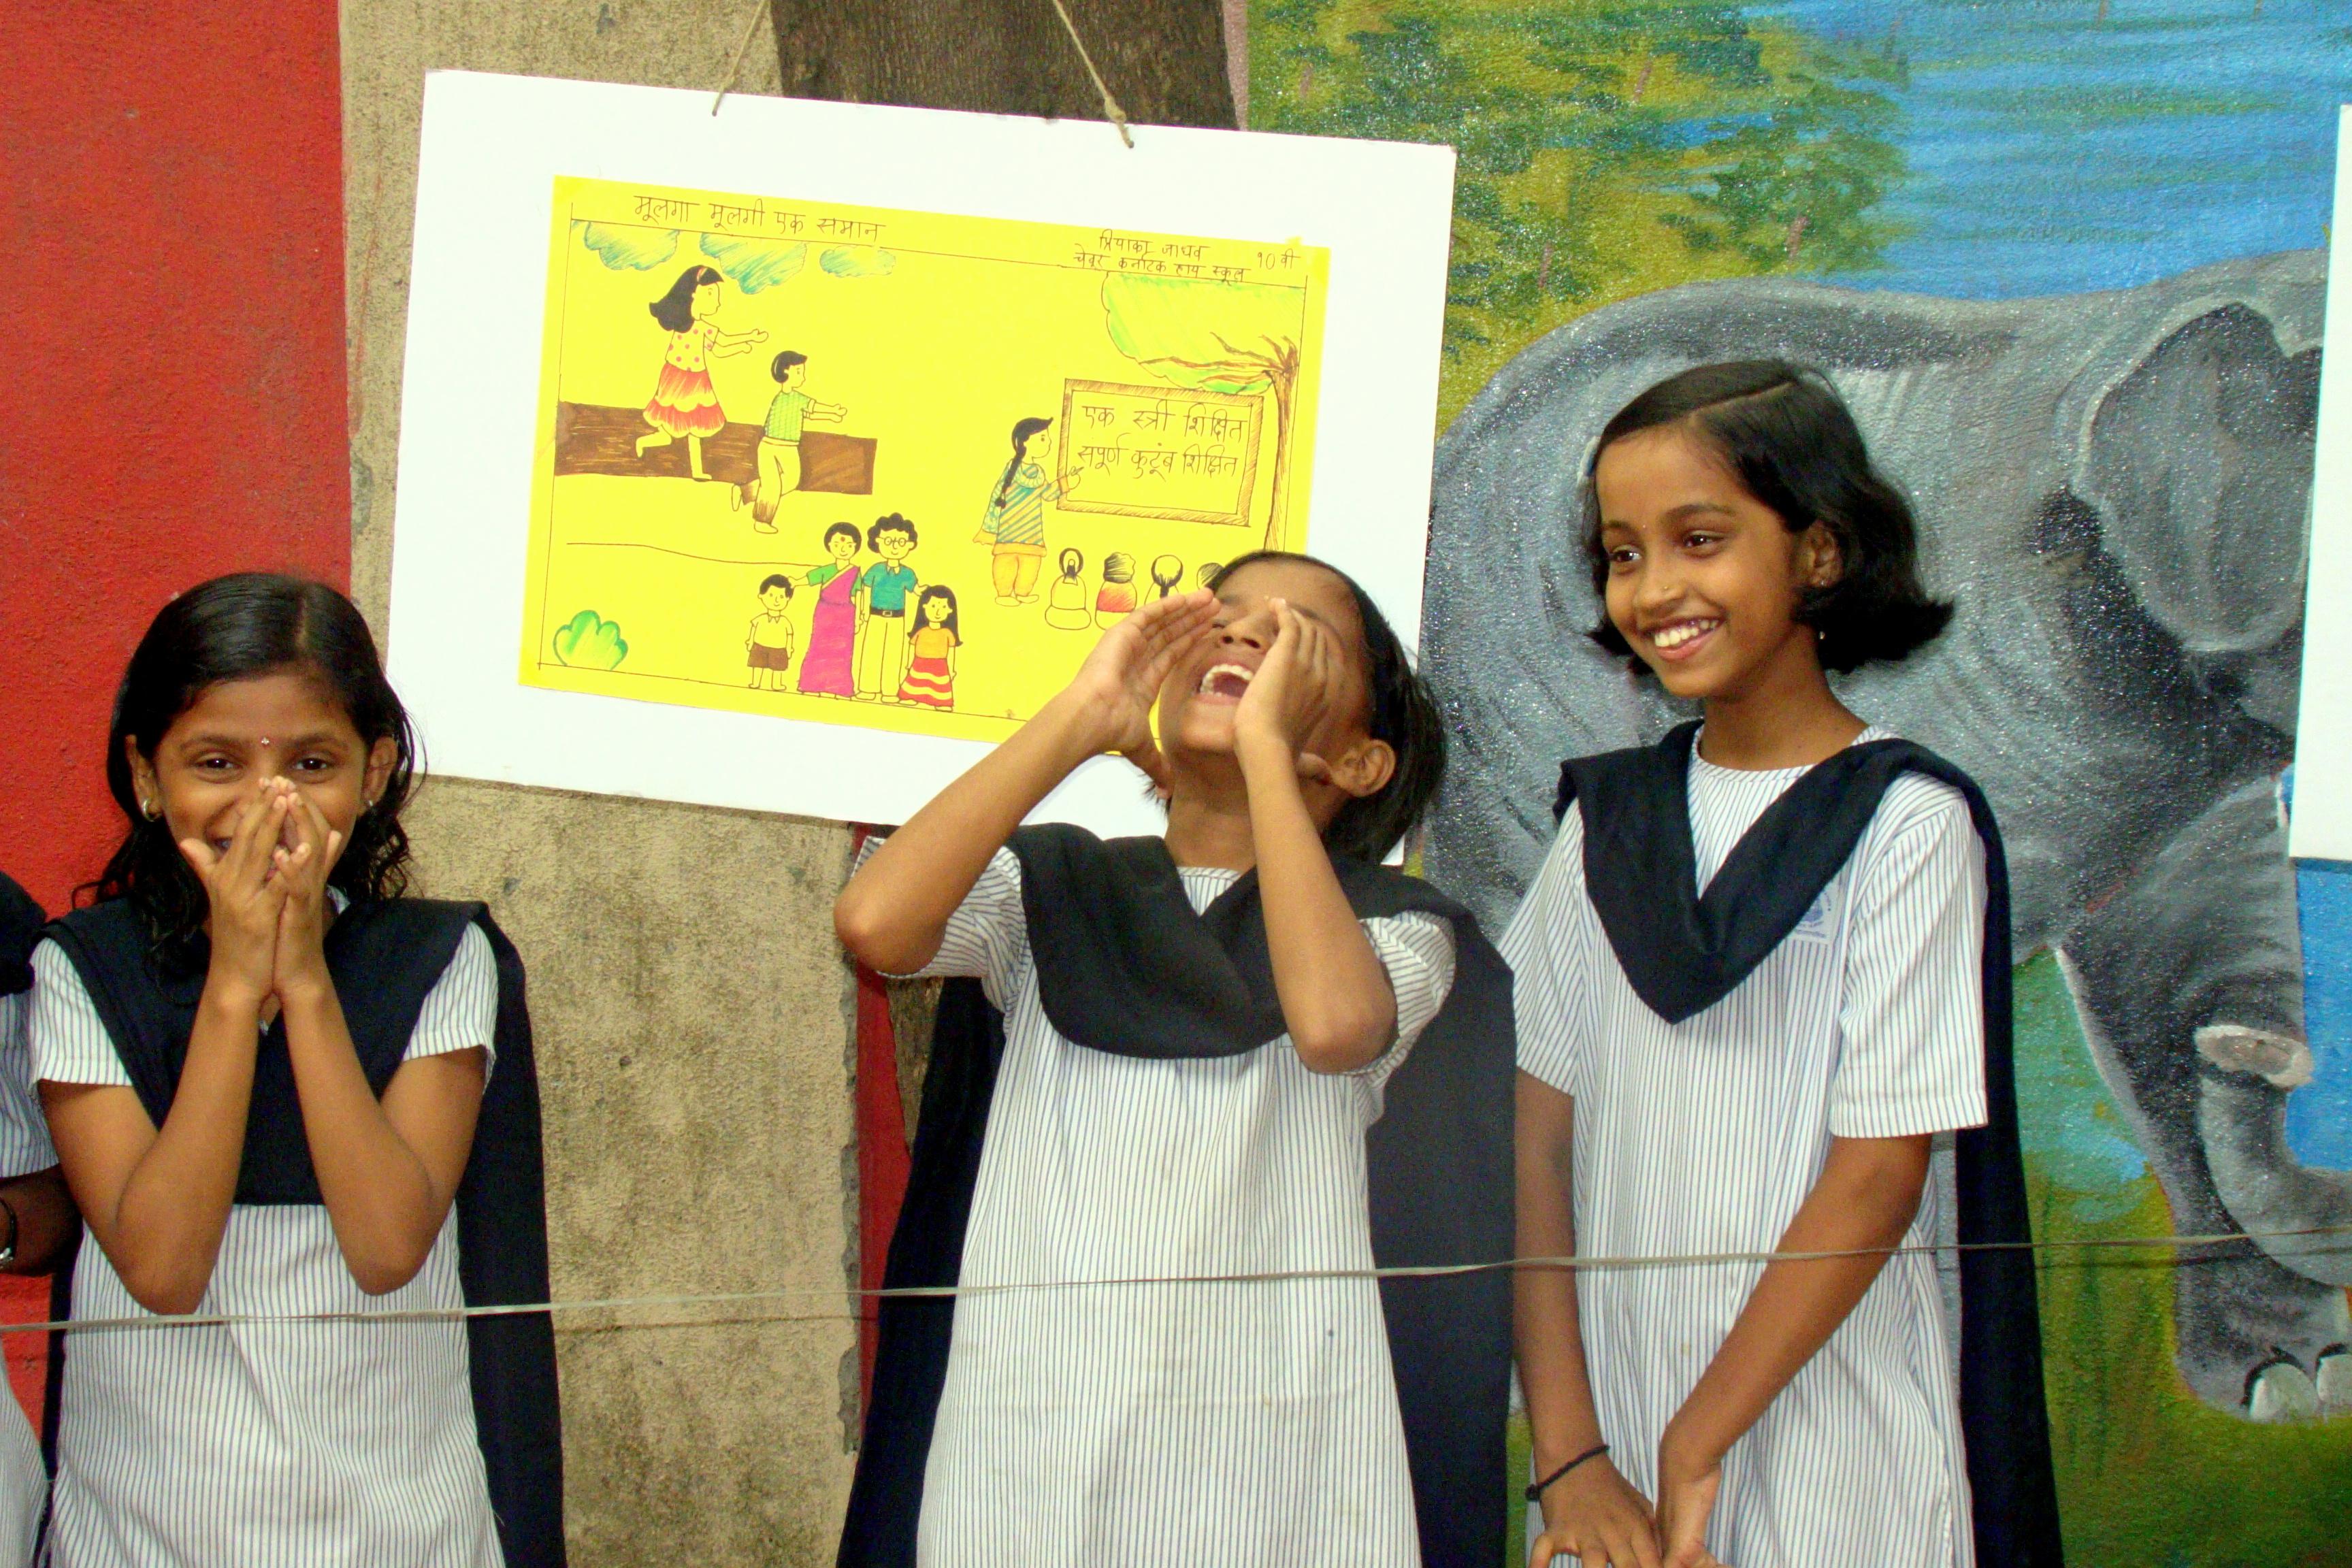 Gender education in municipal schools